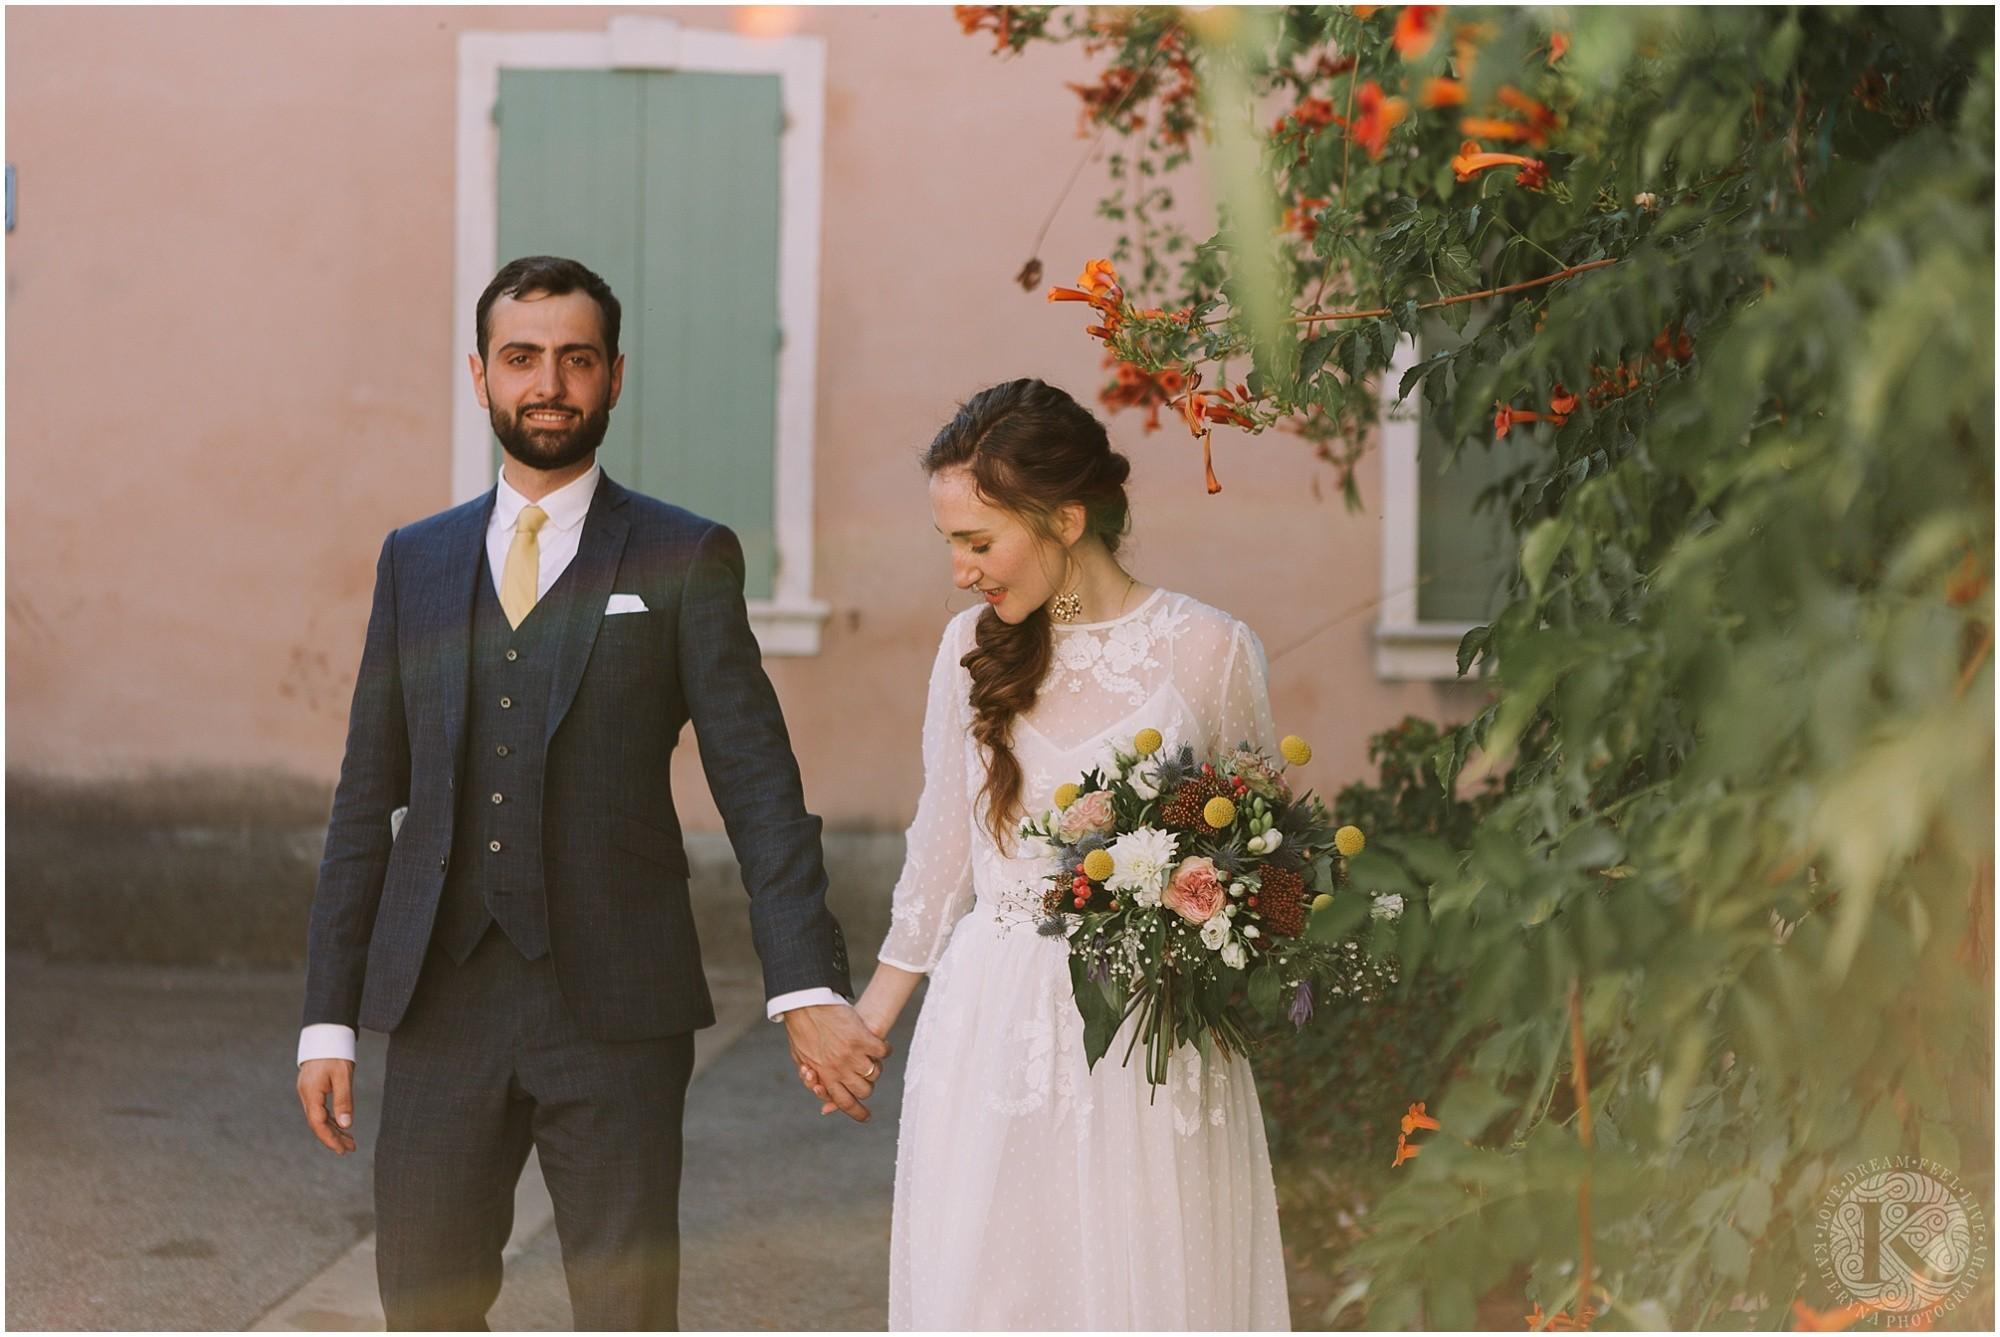 Kateryna-photos-photographe-mariage-vaucluse-provence-avignon-ferme-st-hugues_0050.jpg